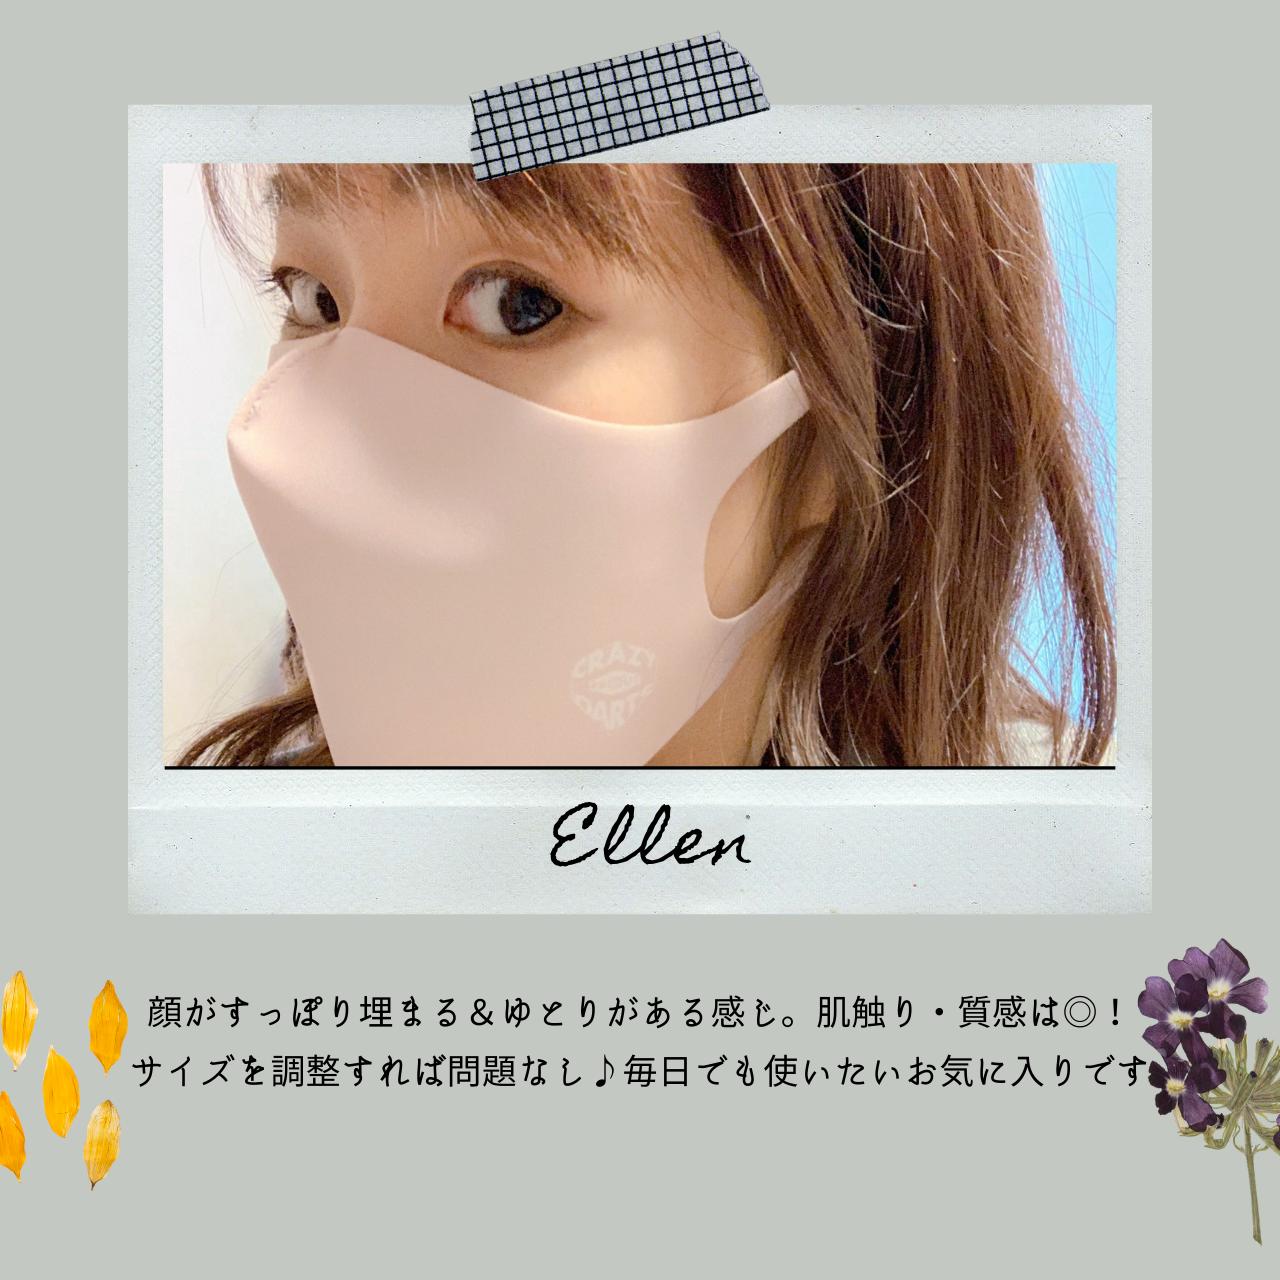 Ellen(エレン)のマスク、いい感じです♪